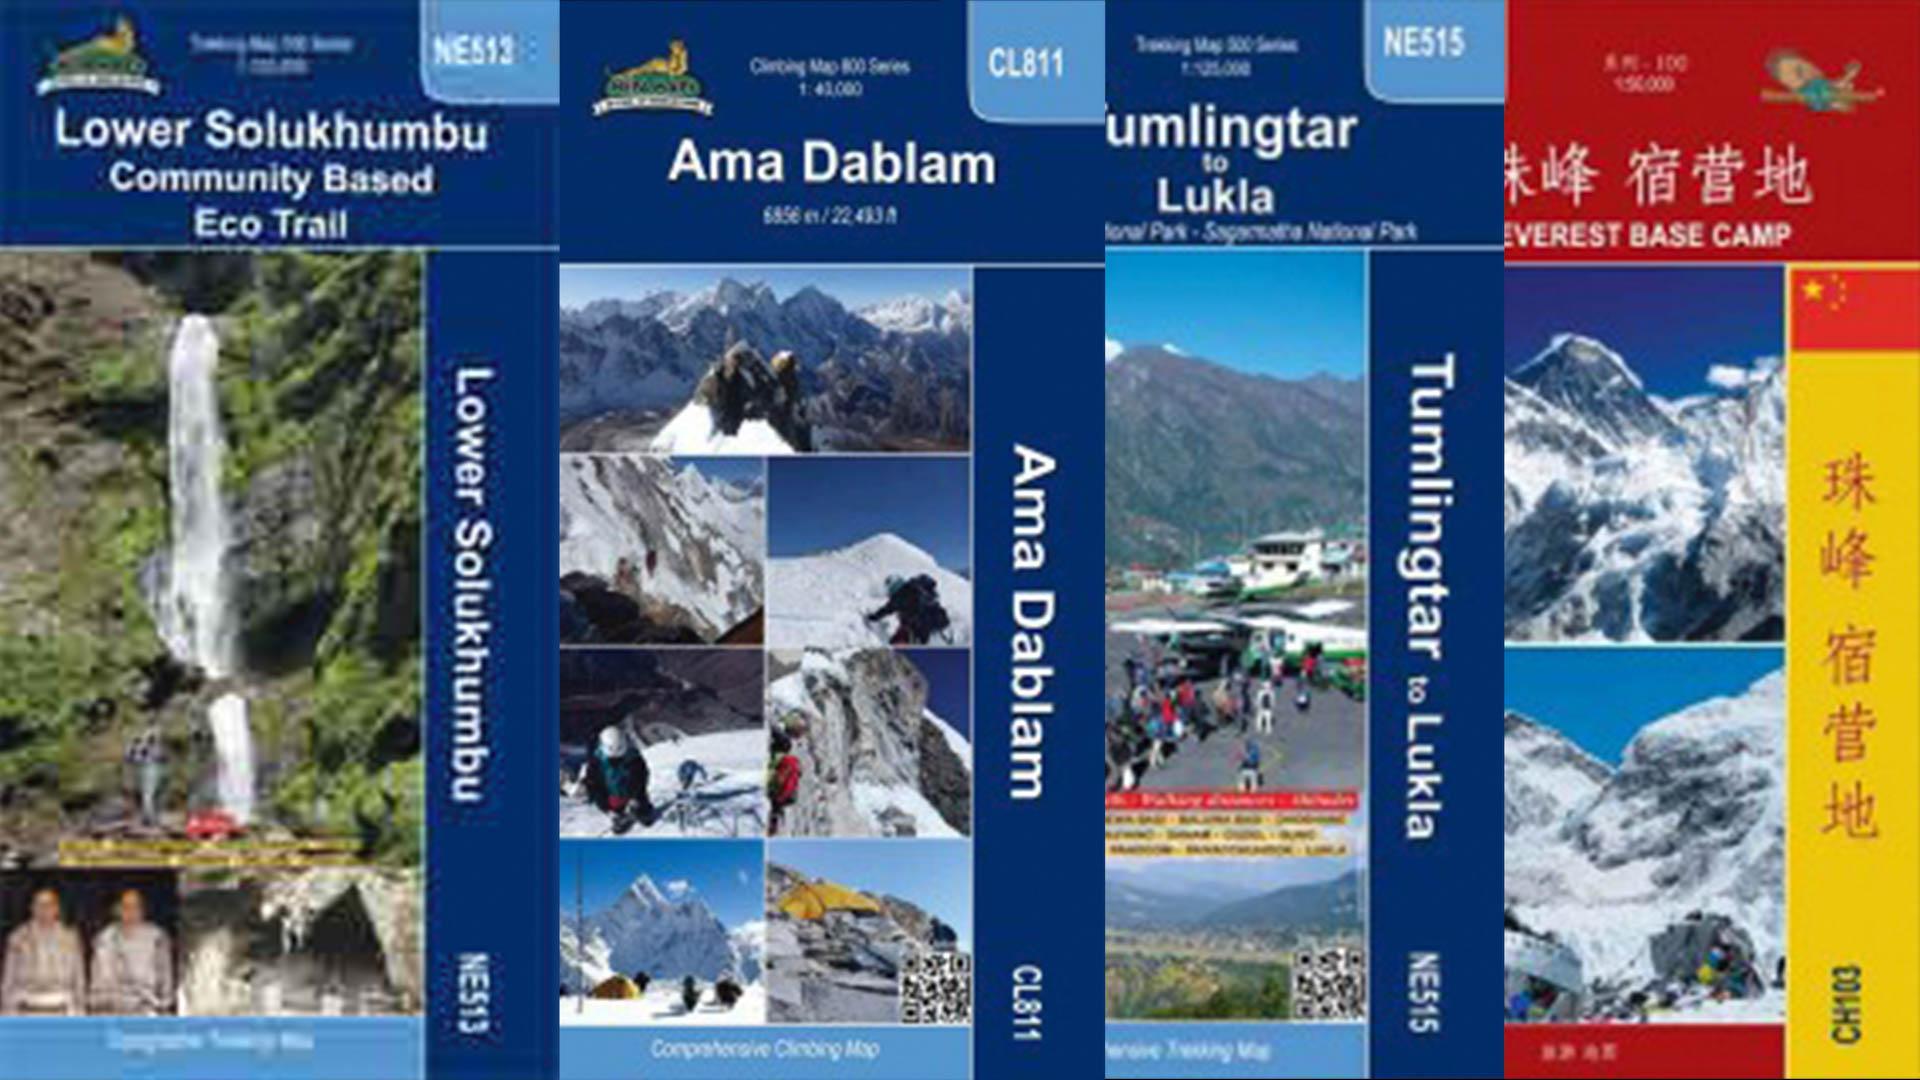 Maps by Himalaya Map House